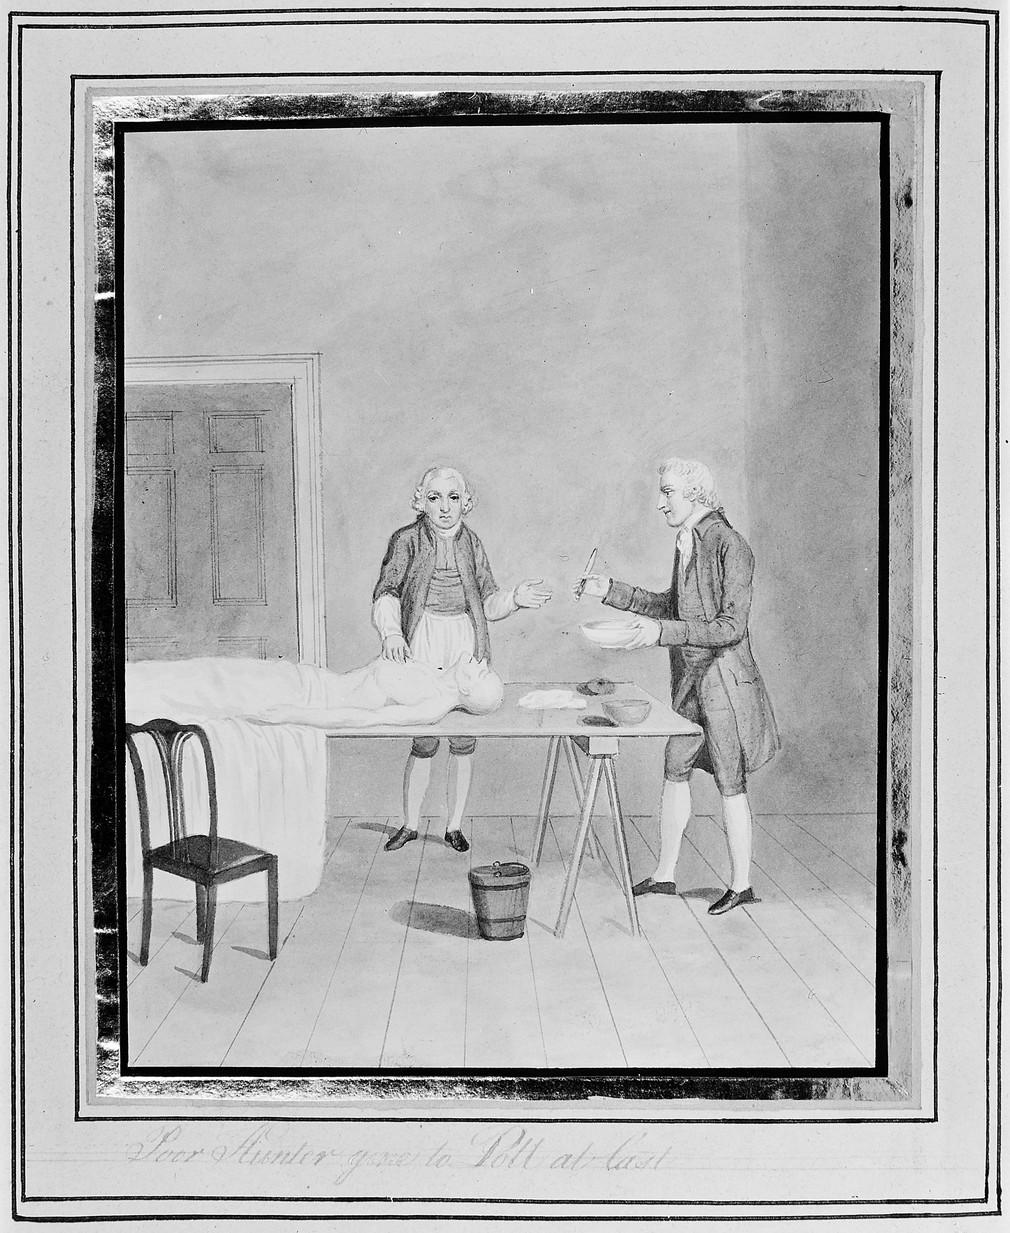 Jonh Hunter e i chirurghi inglesi nel Settecento